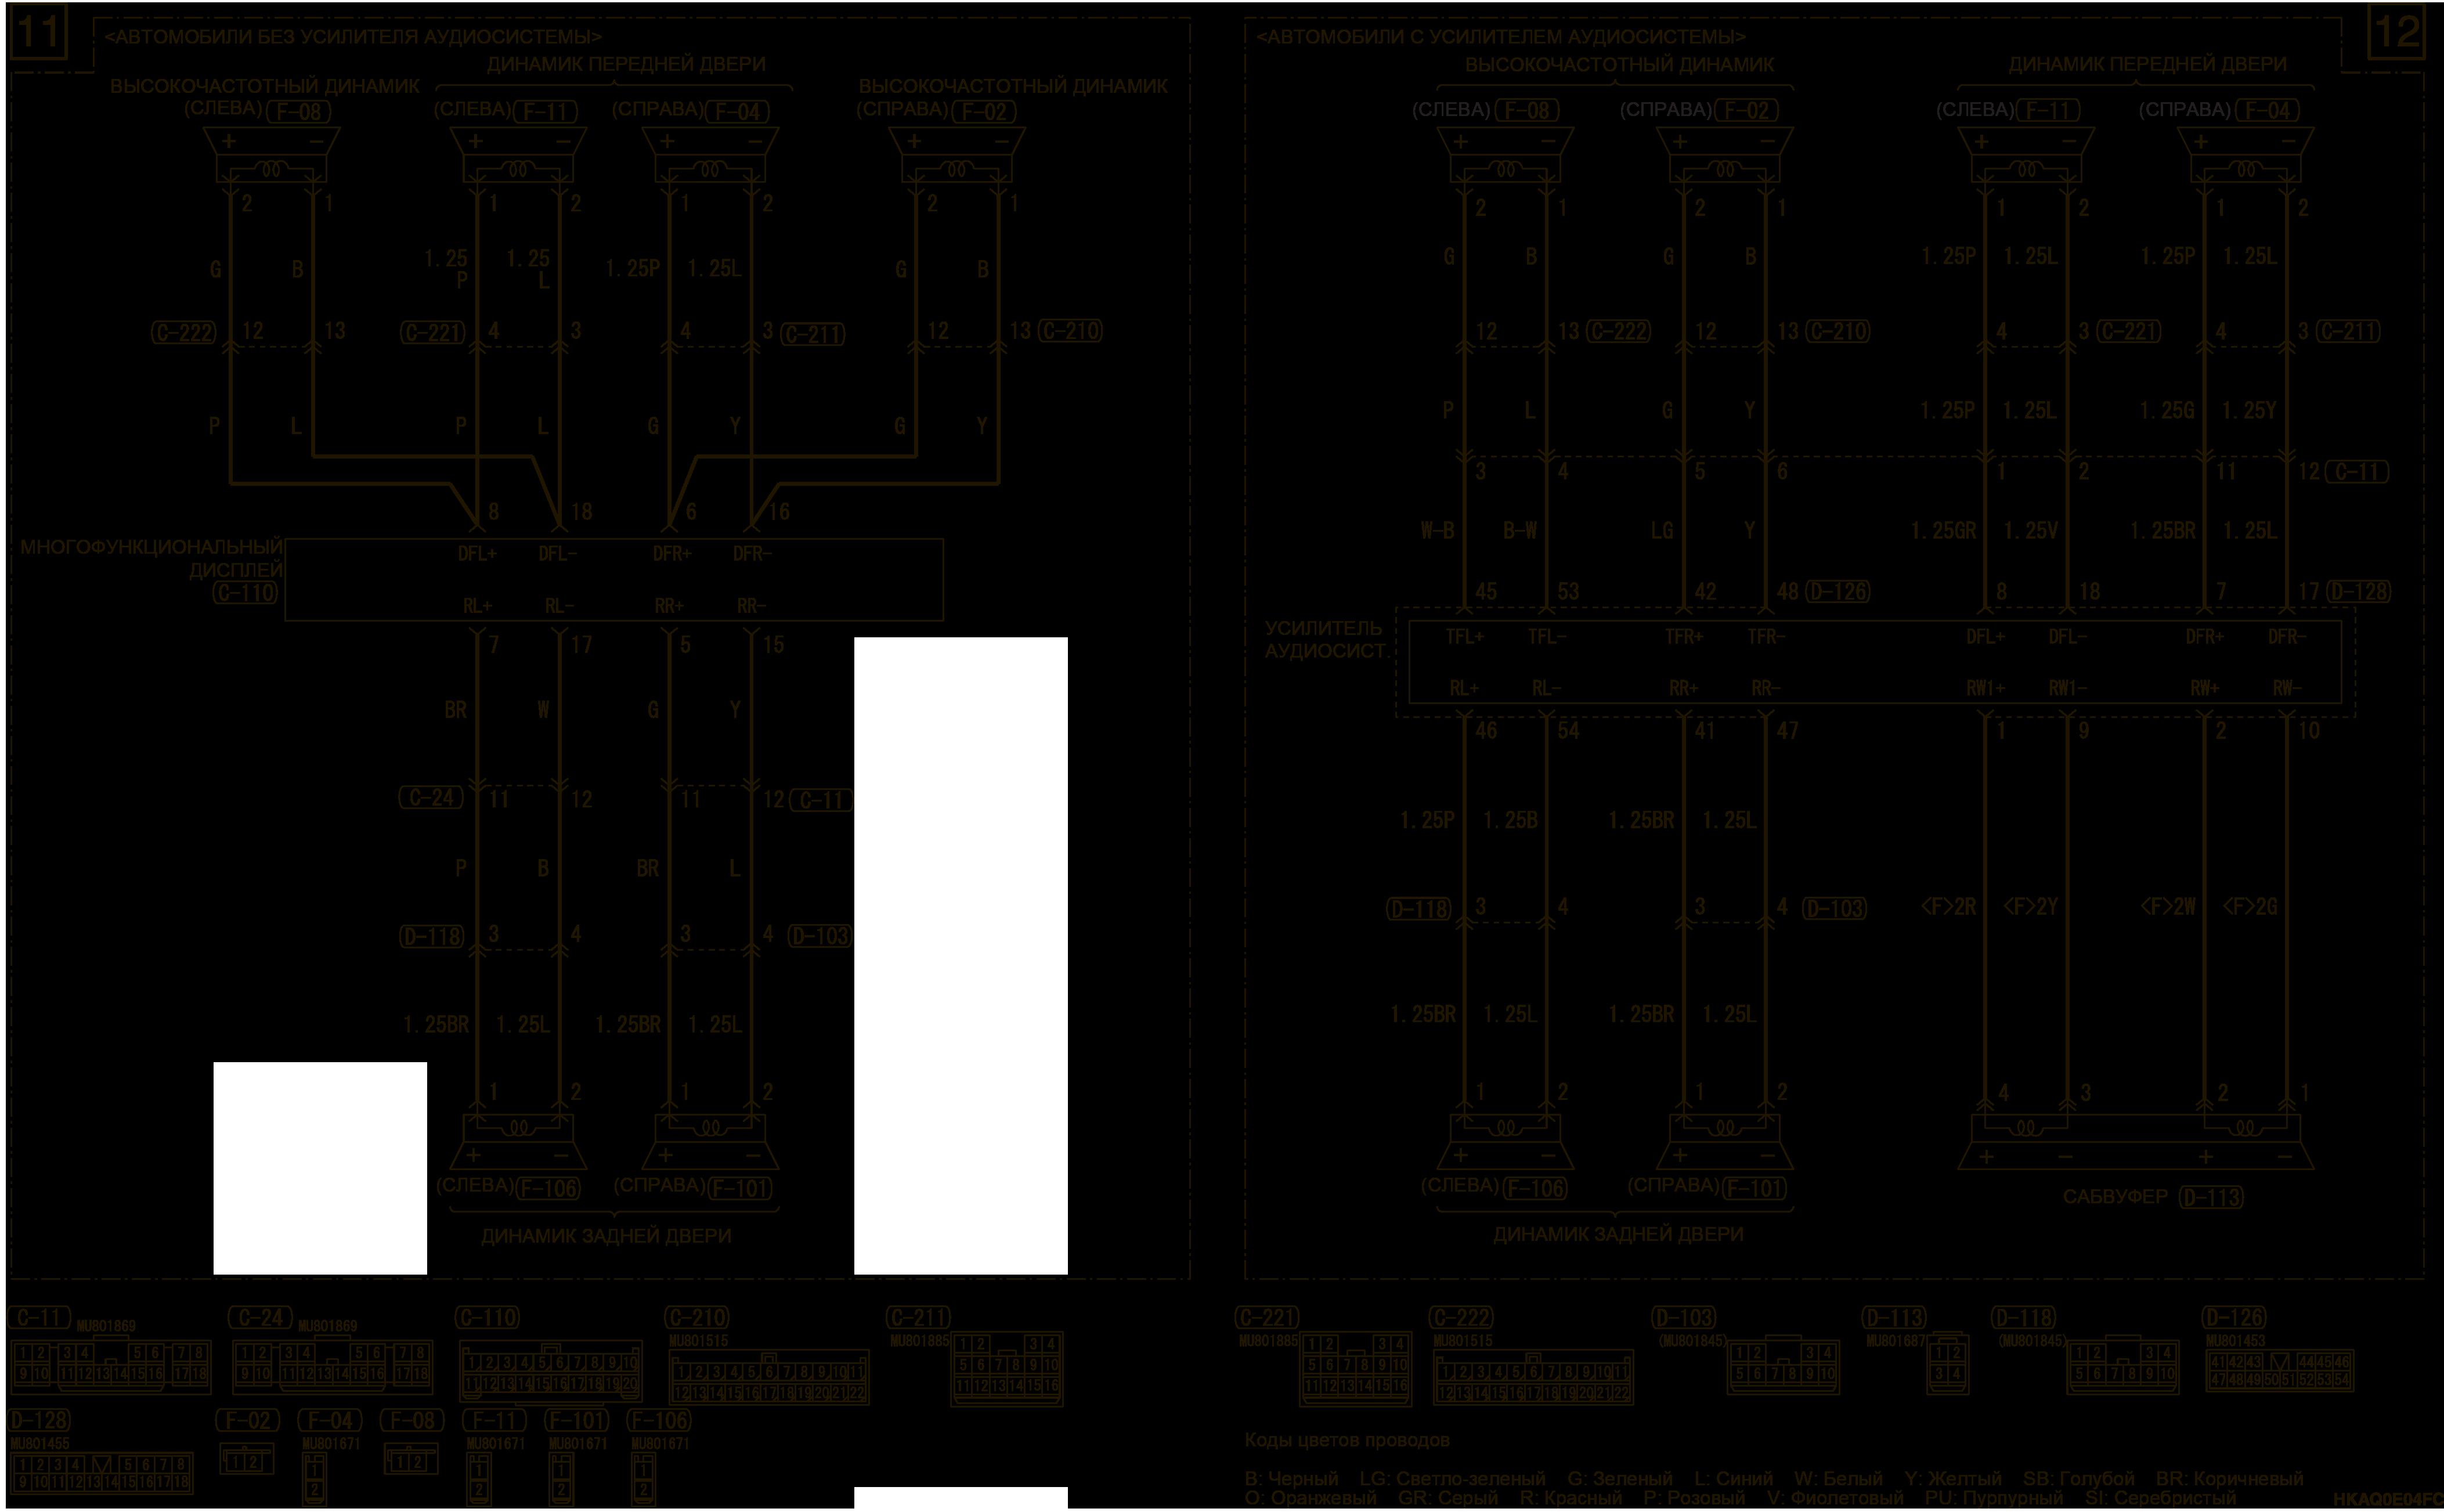 mmc аутлендер 3 2019 электросхемаMMCS Слева